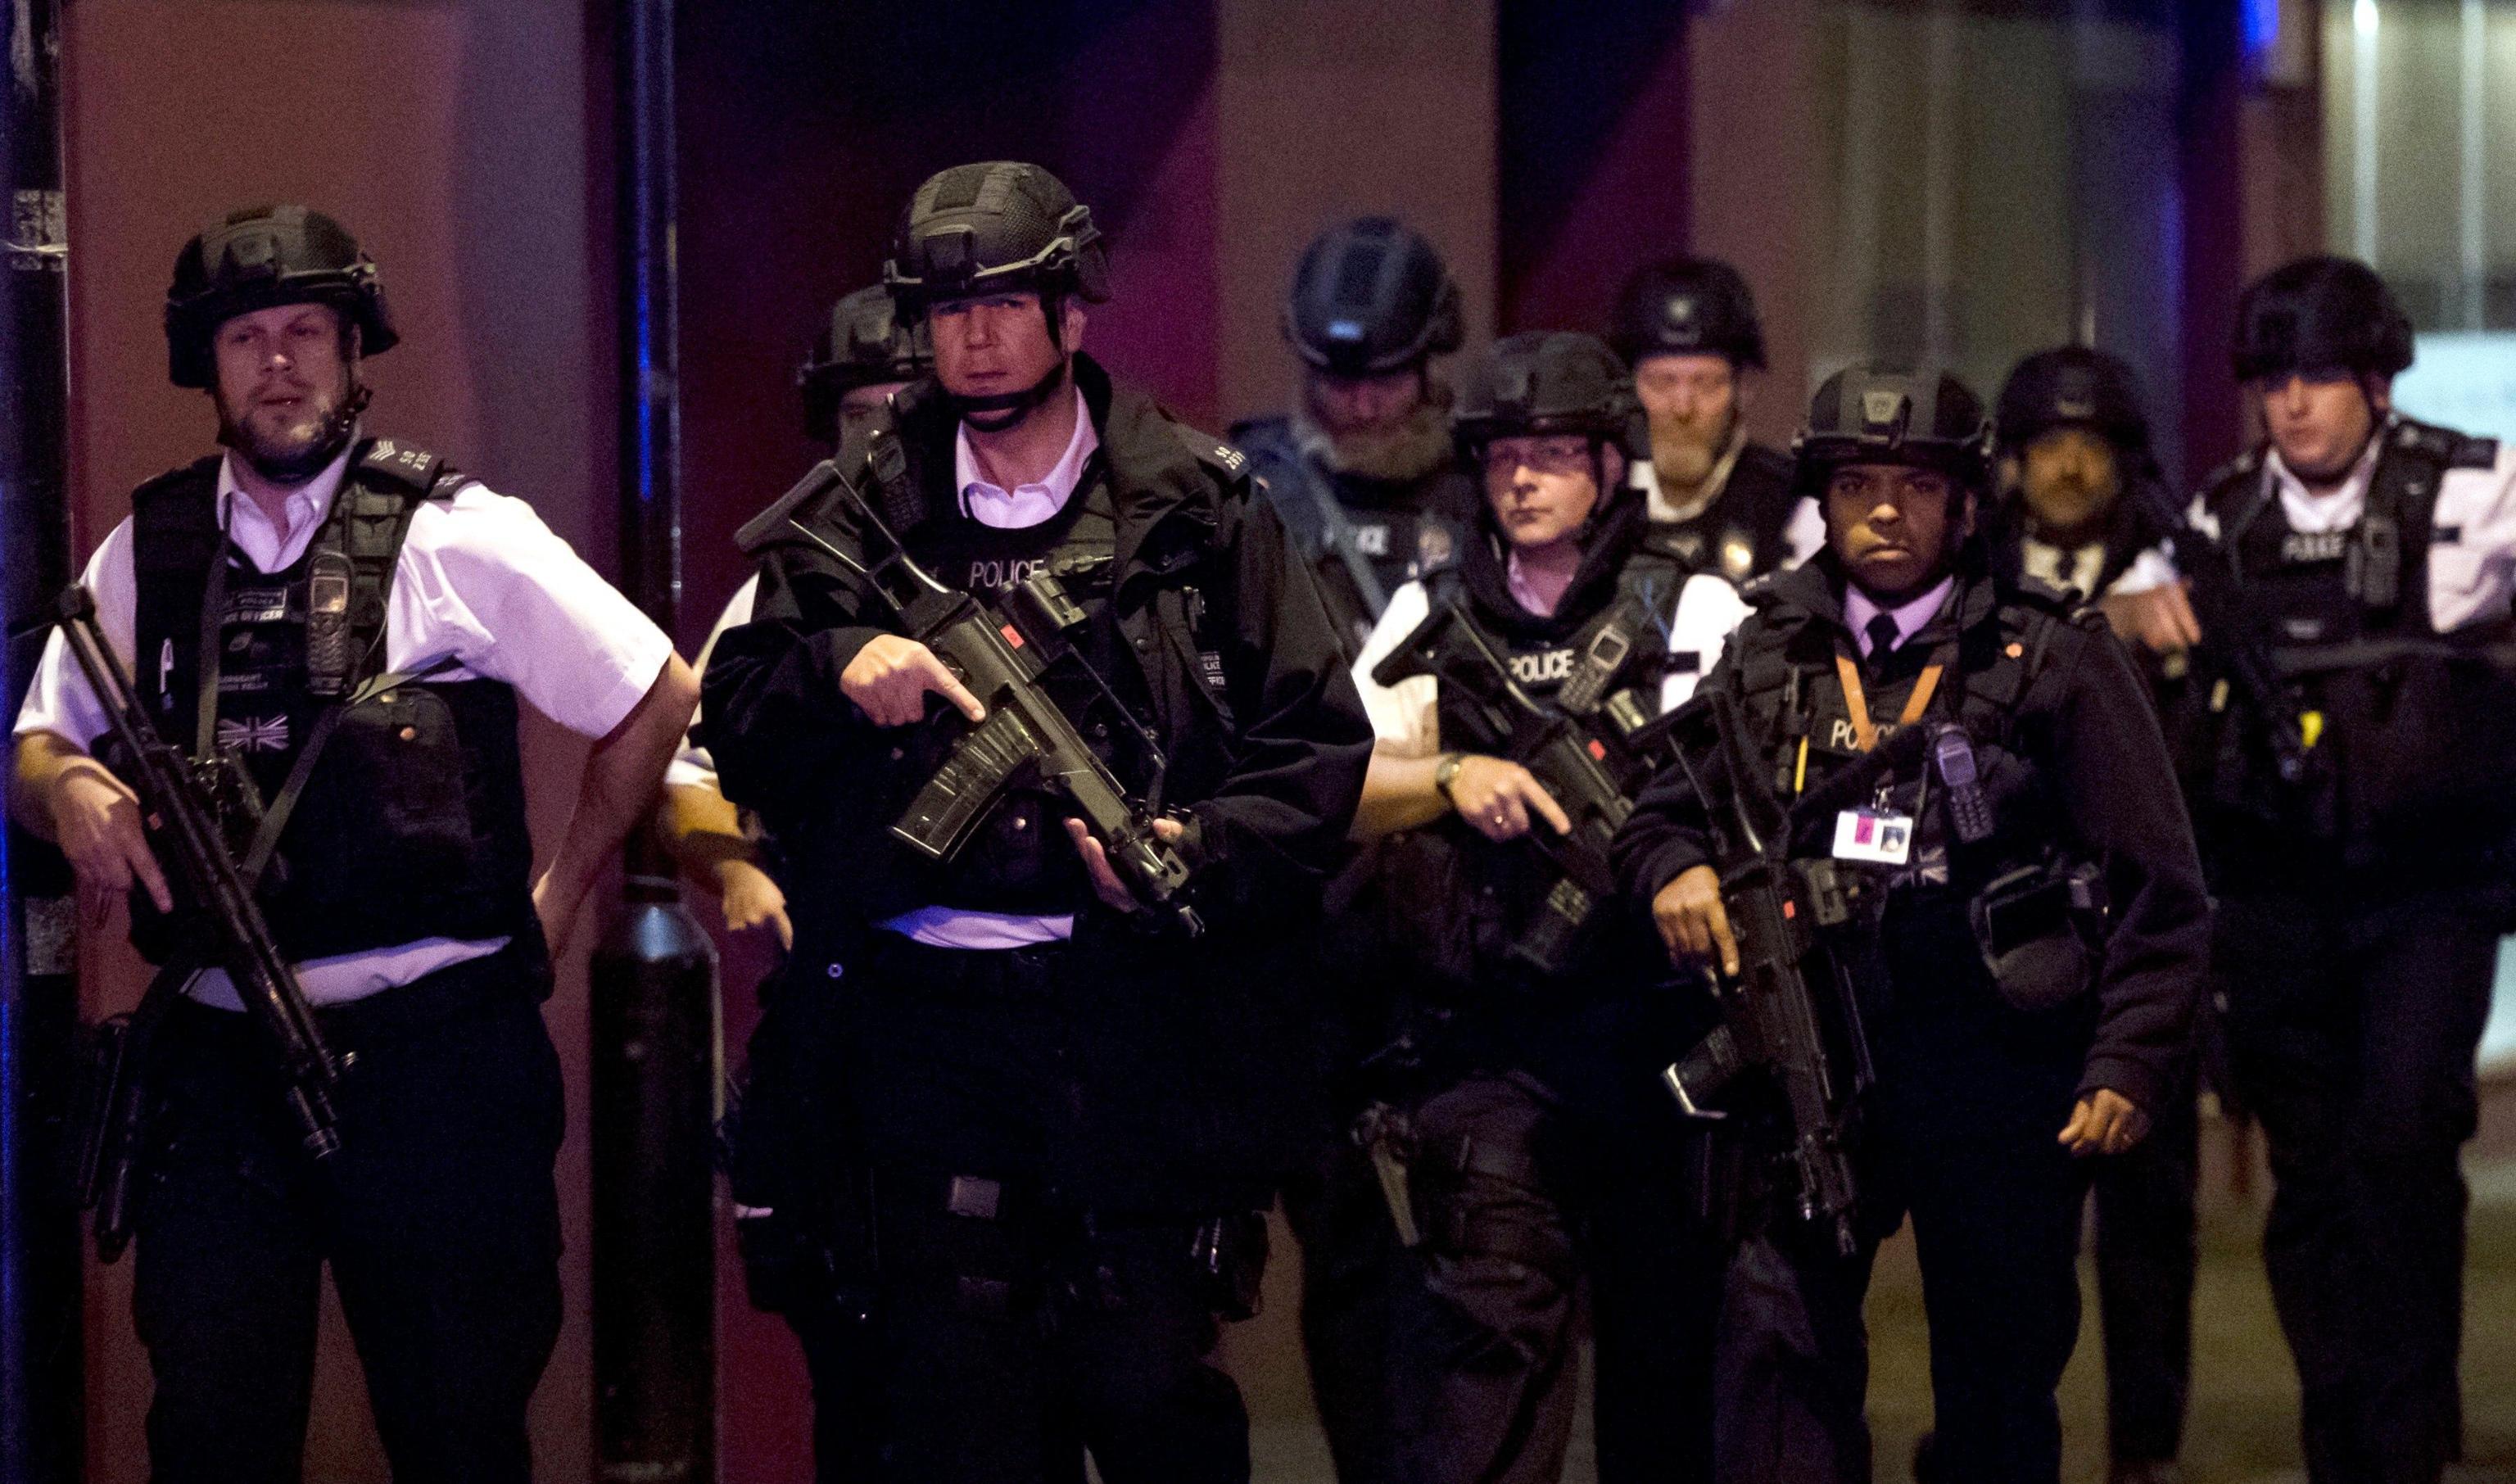 Reports of a van hitting pedestrials at London Bridge and stabbings in Borough Market